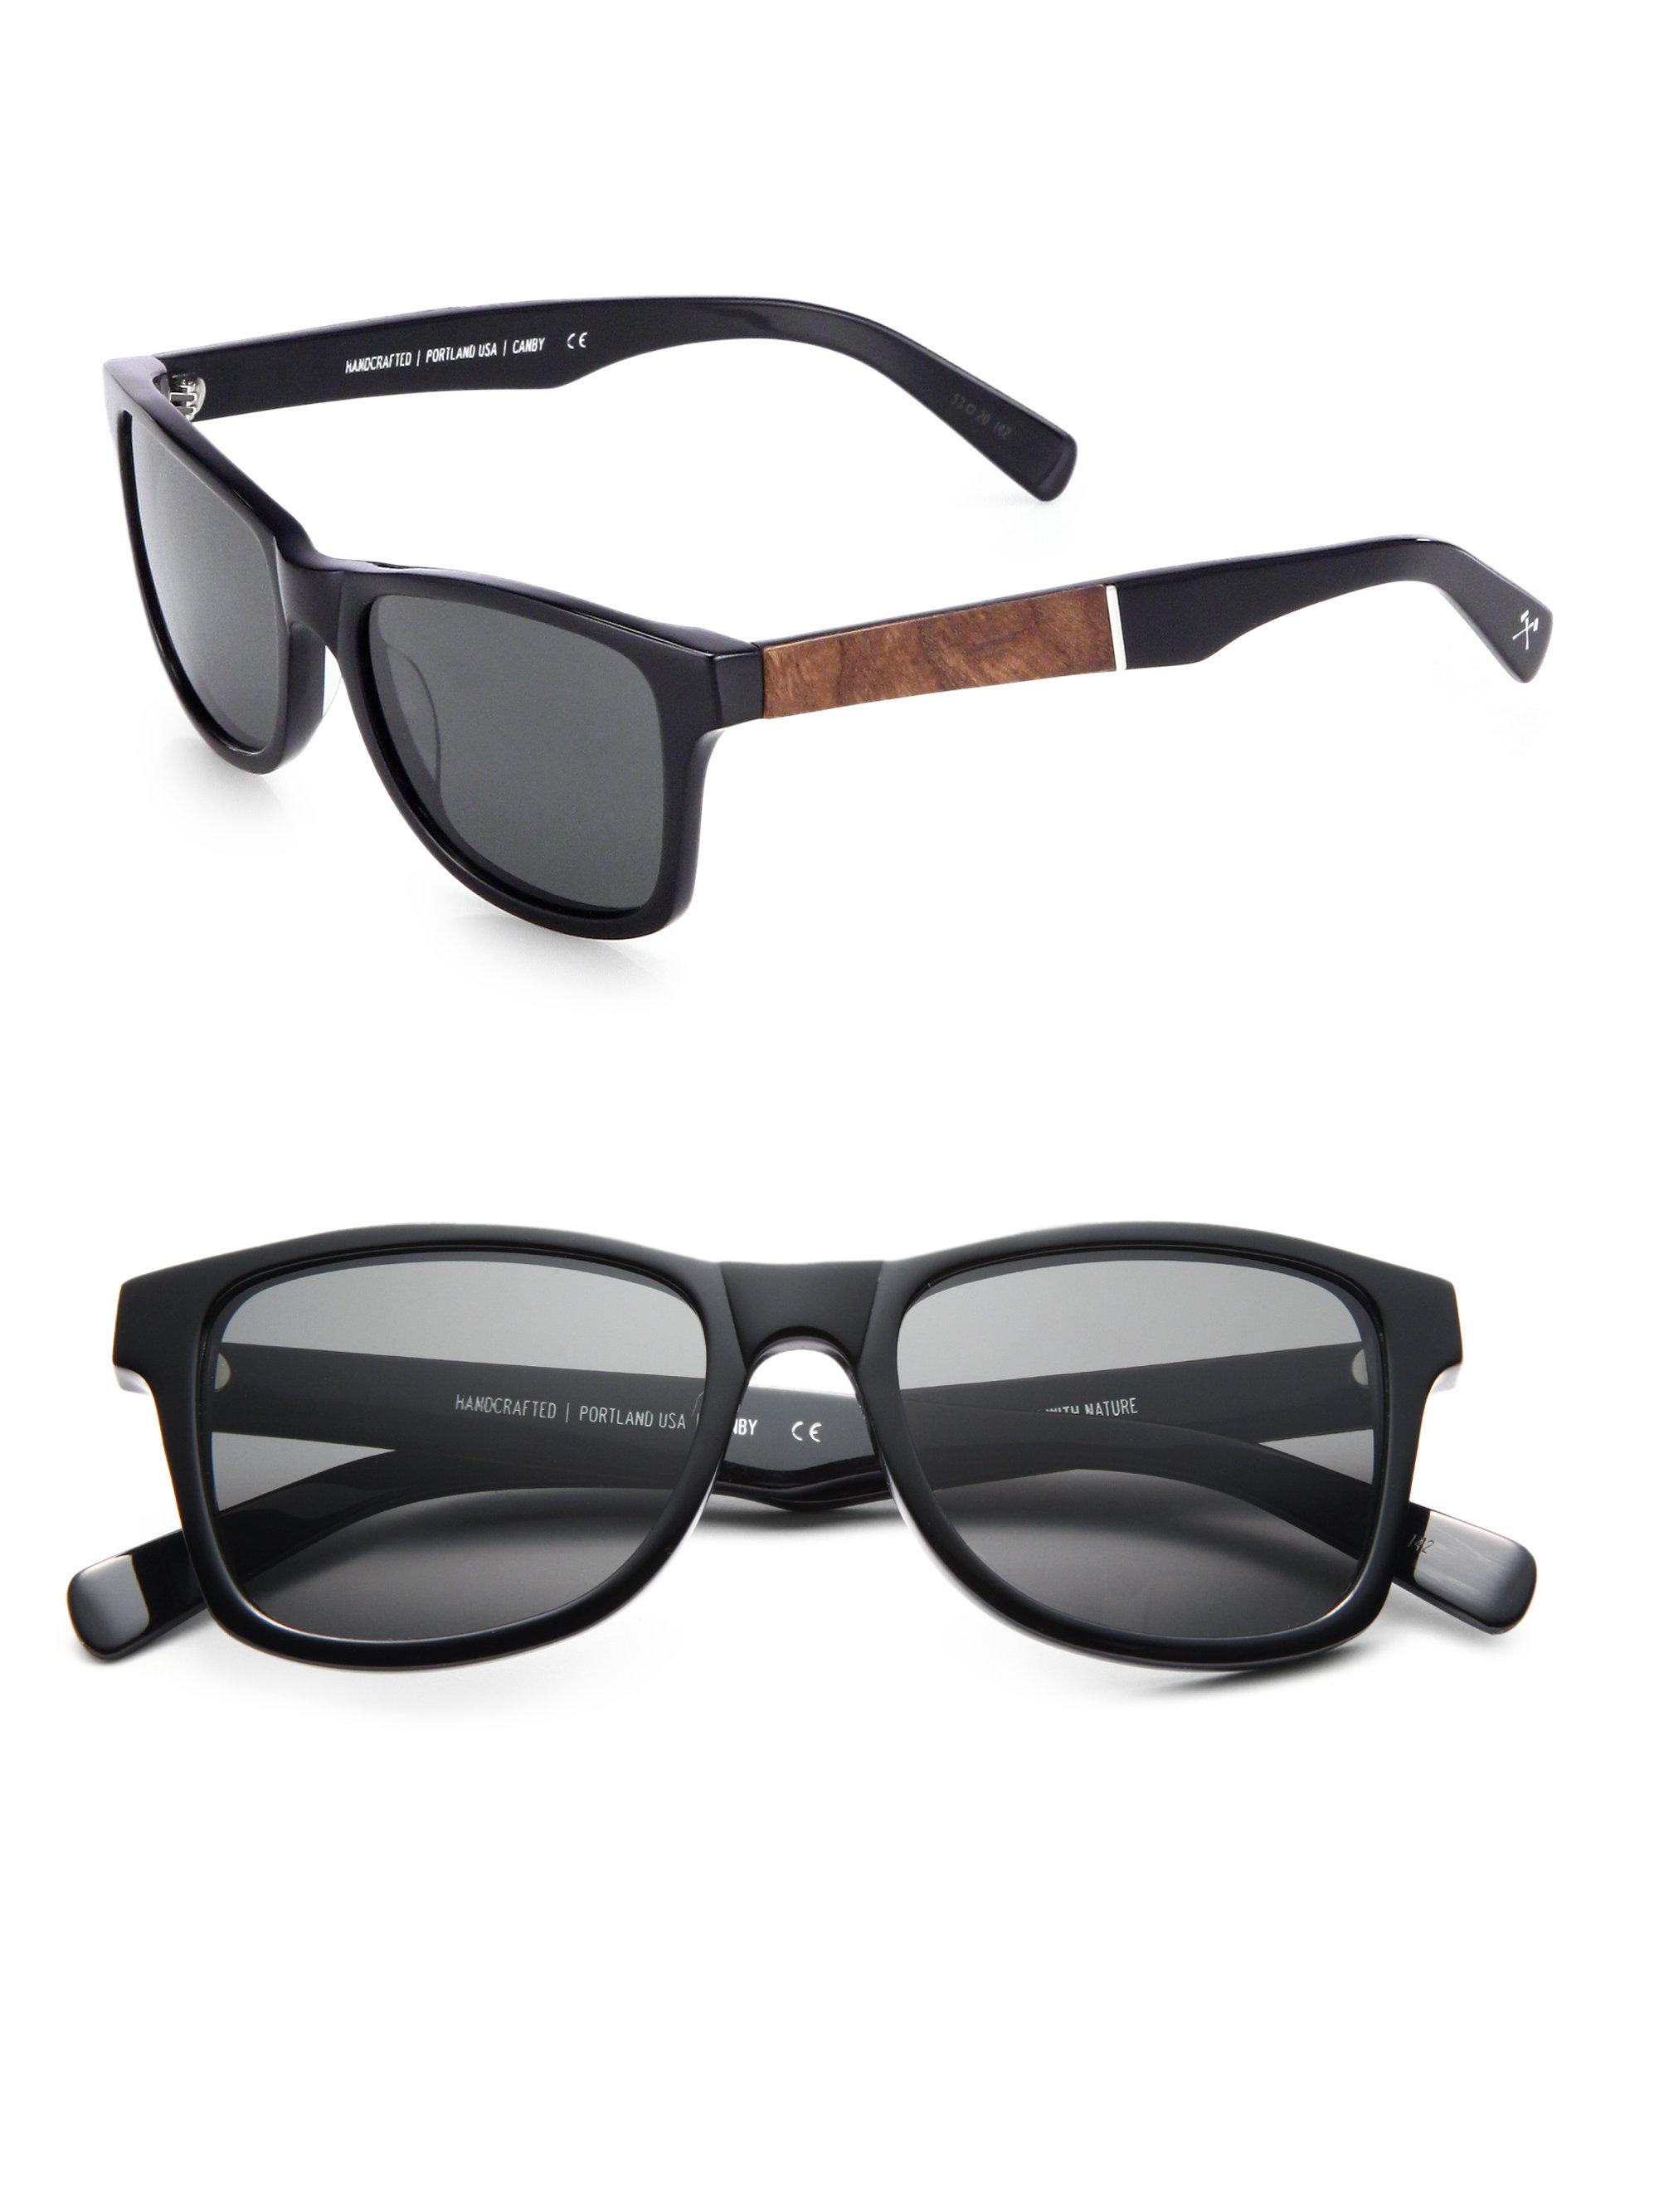 134fe2f68c4 Lyst - Shwood Canby Elm Burl   Acetate Sunglasses in Black for Men